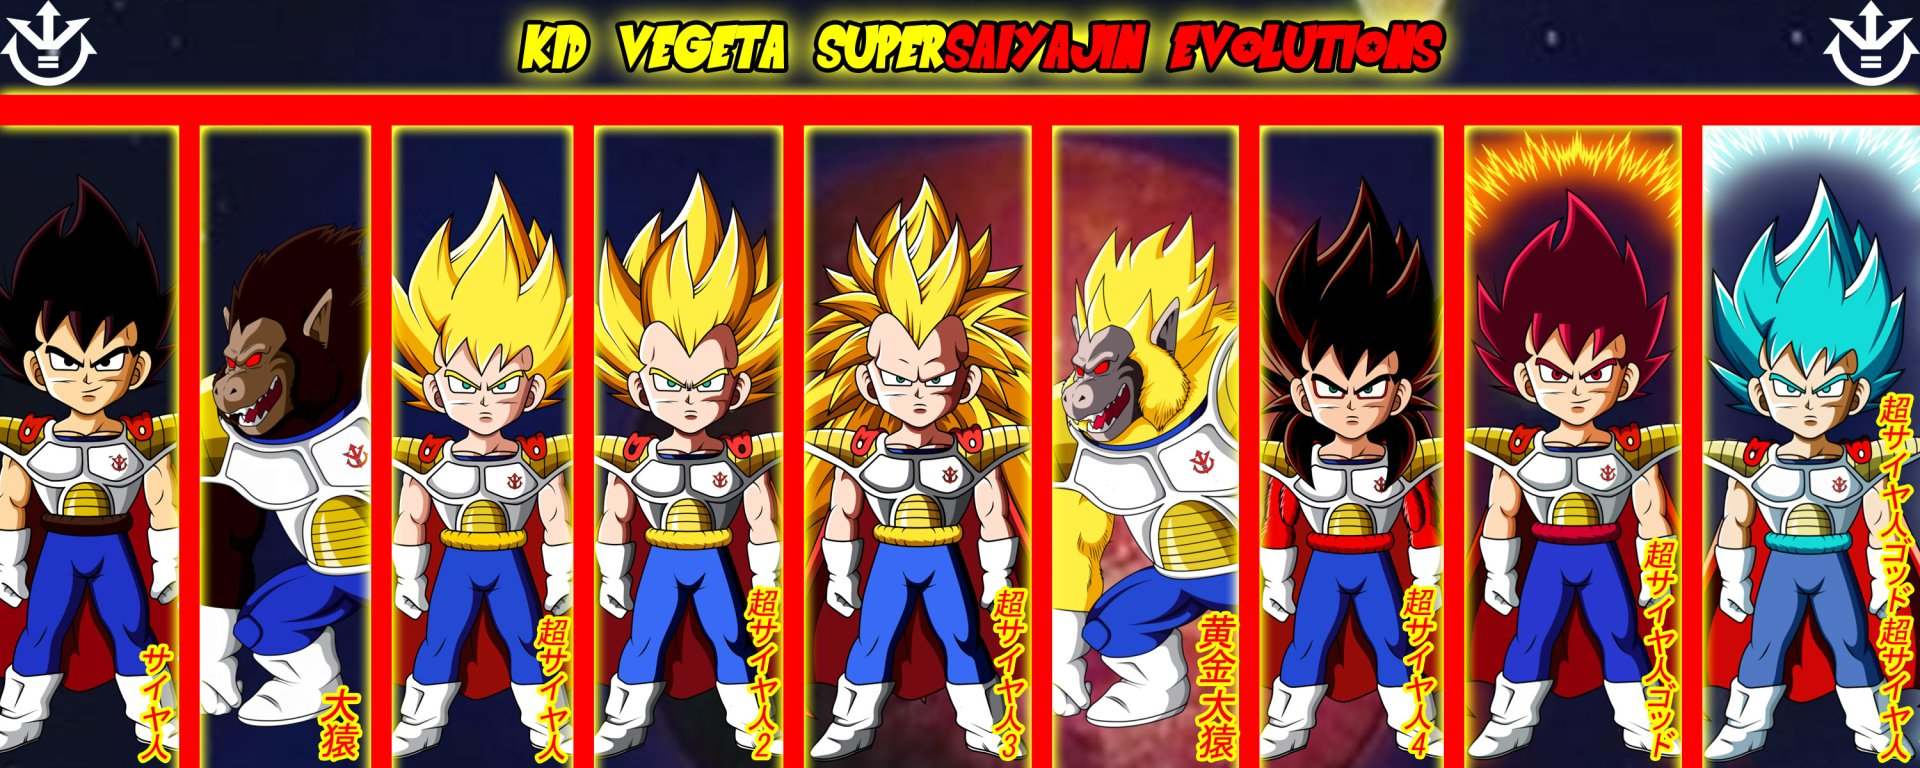 Goku And Vegeta Full Hd Fondo De Pantalla And Fondo De: Kid Vegeta Supersaiyajin Evolutions Full HD Fondo De